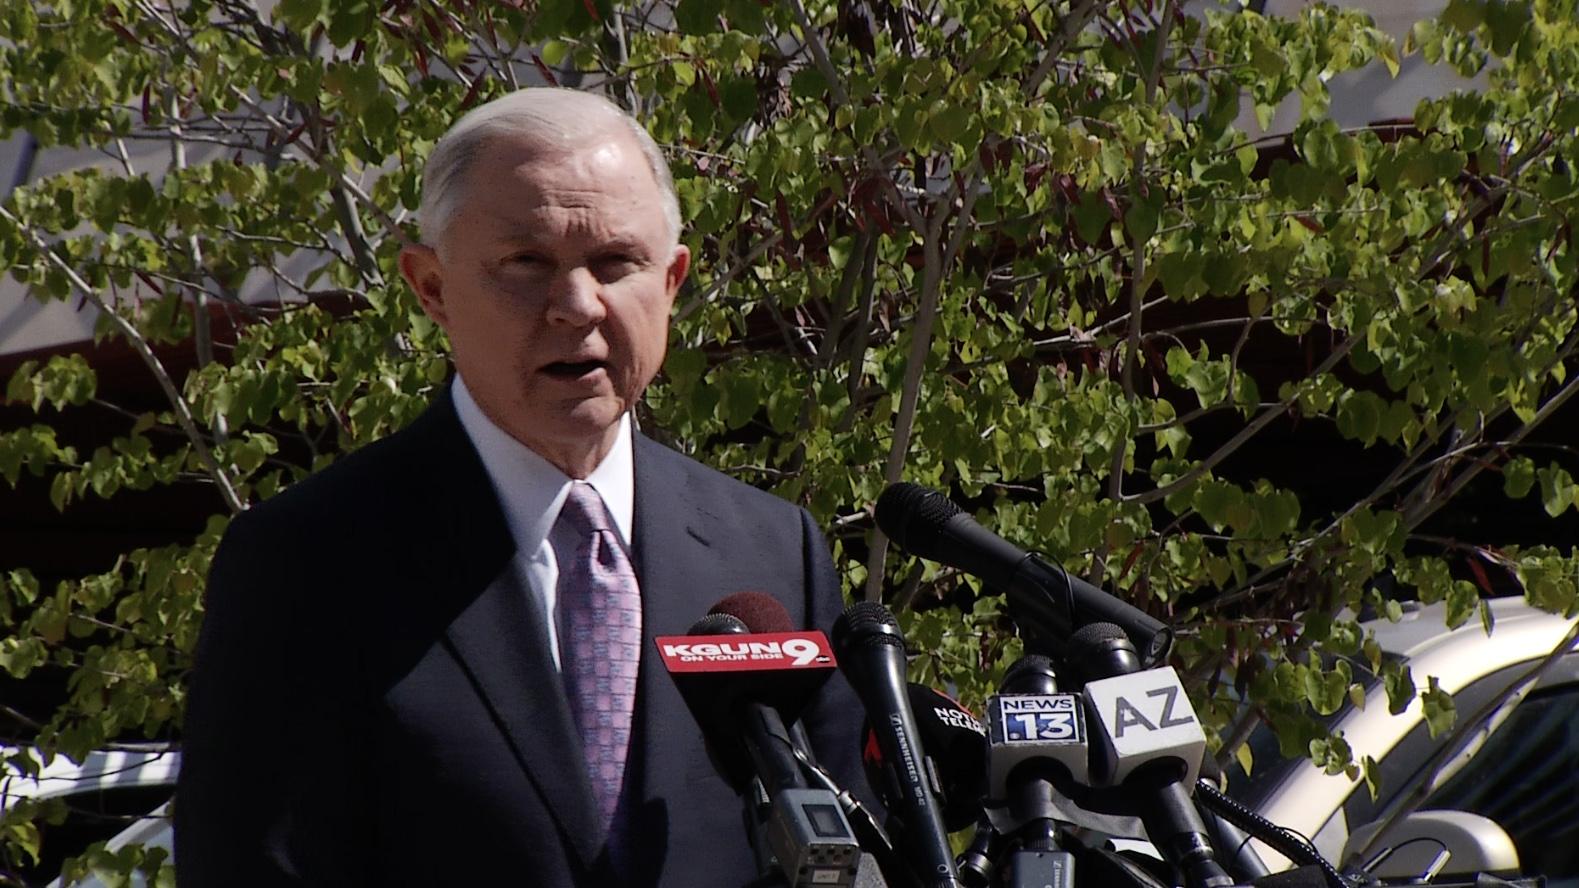 U.S. Attorney General Jeff Sessions visits Nogales, Ariz. April 11, 2017, to announce new immigration enforcement measures.